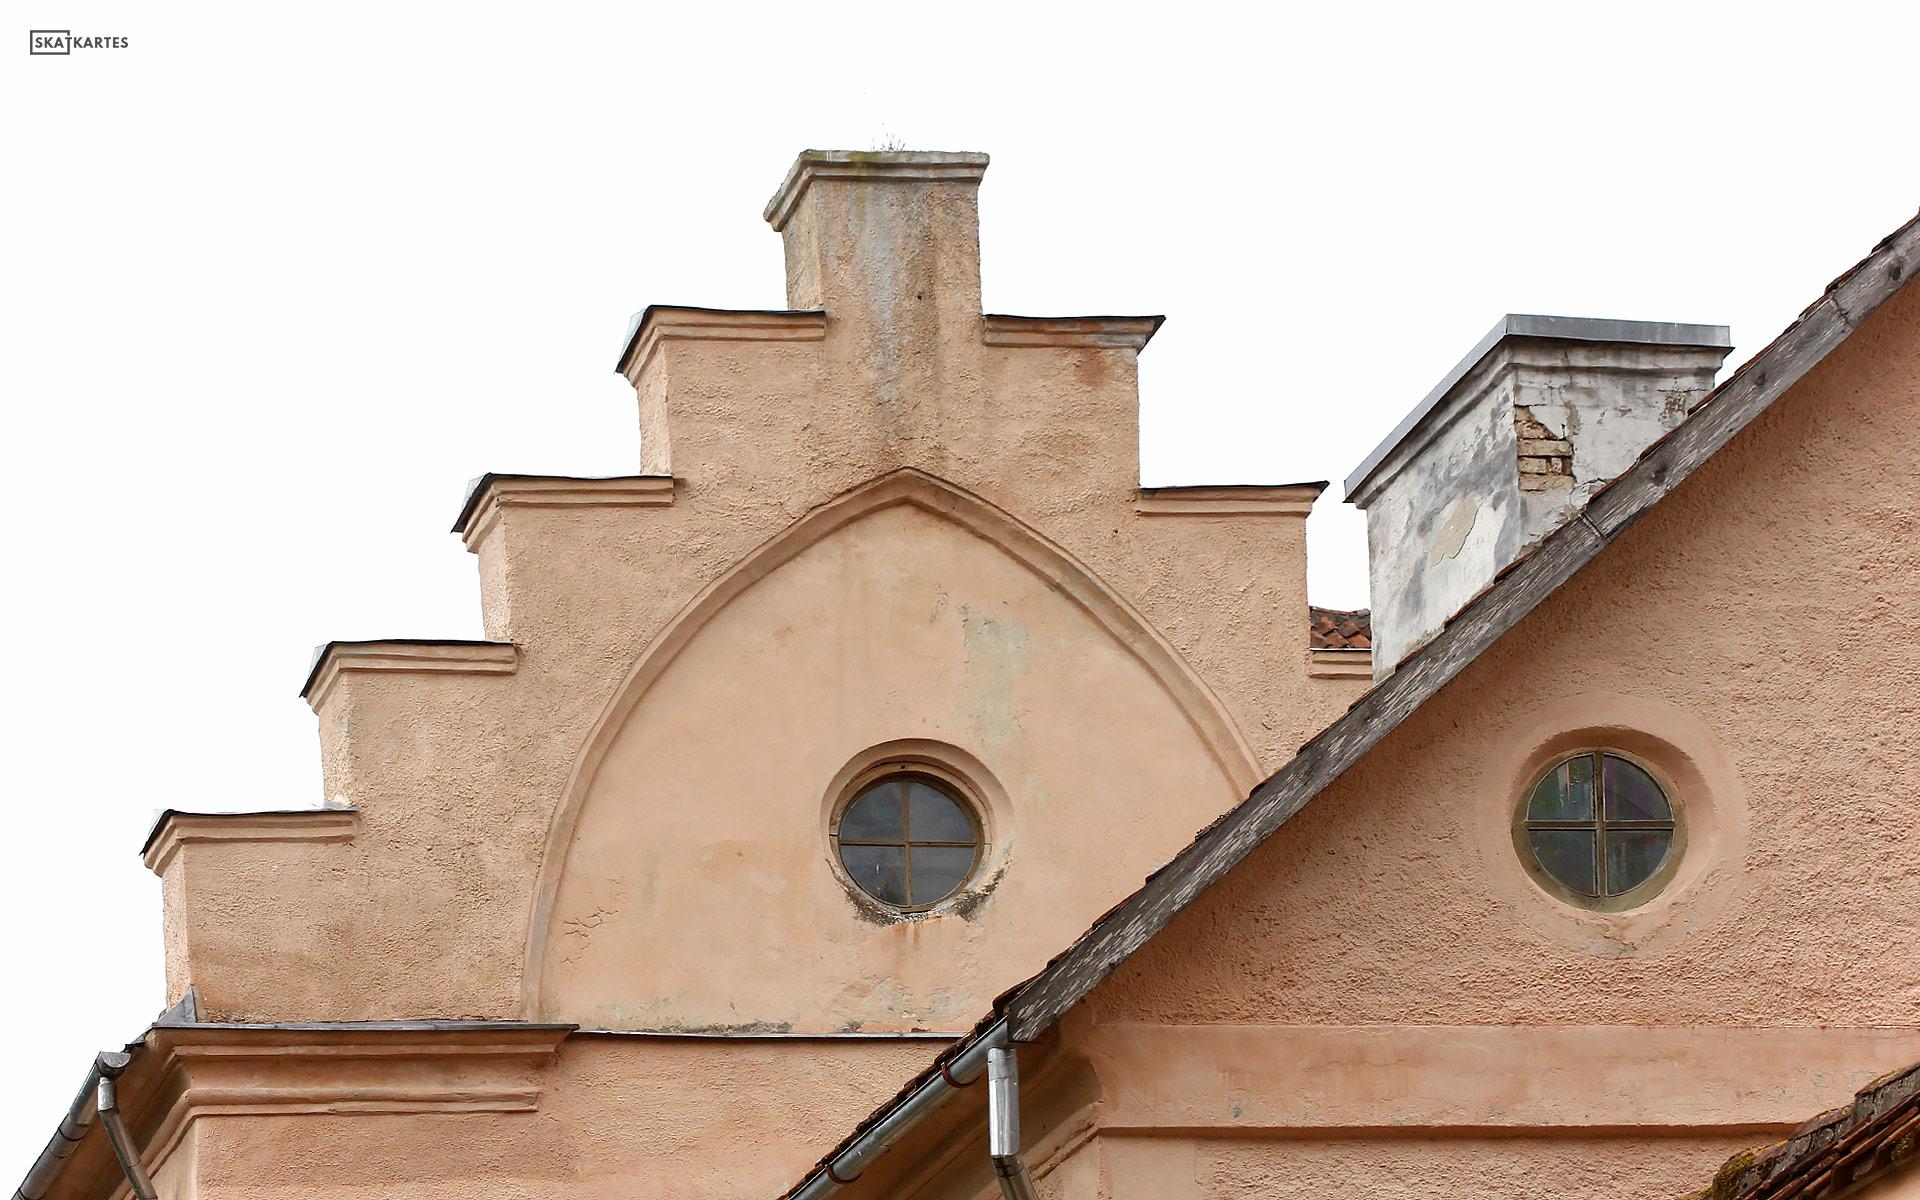 Skatkartes-Latvija-Vasara-Kurzeme-Edoles-pils-sienas-fragments